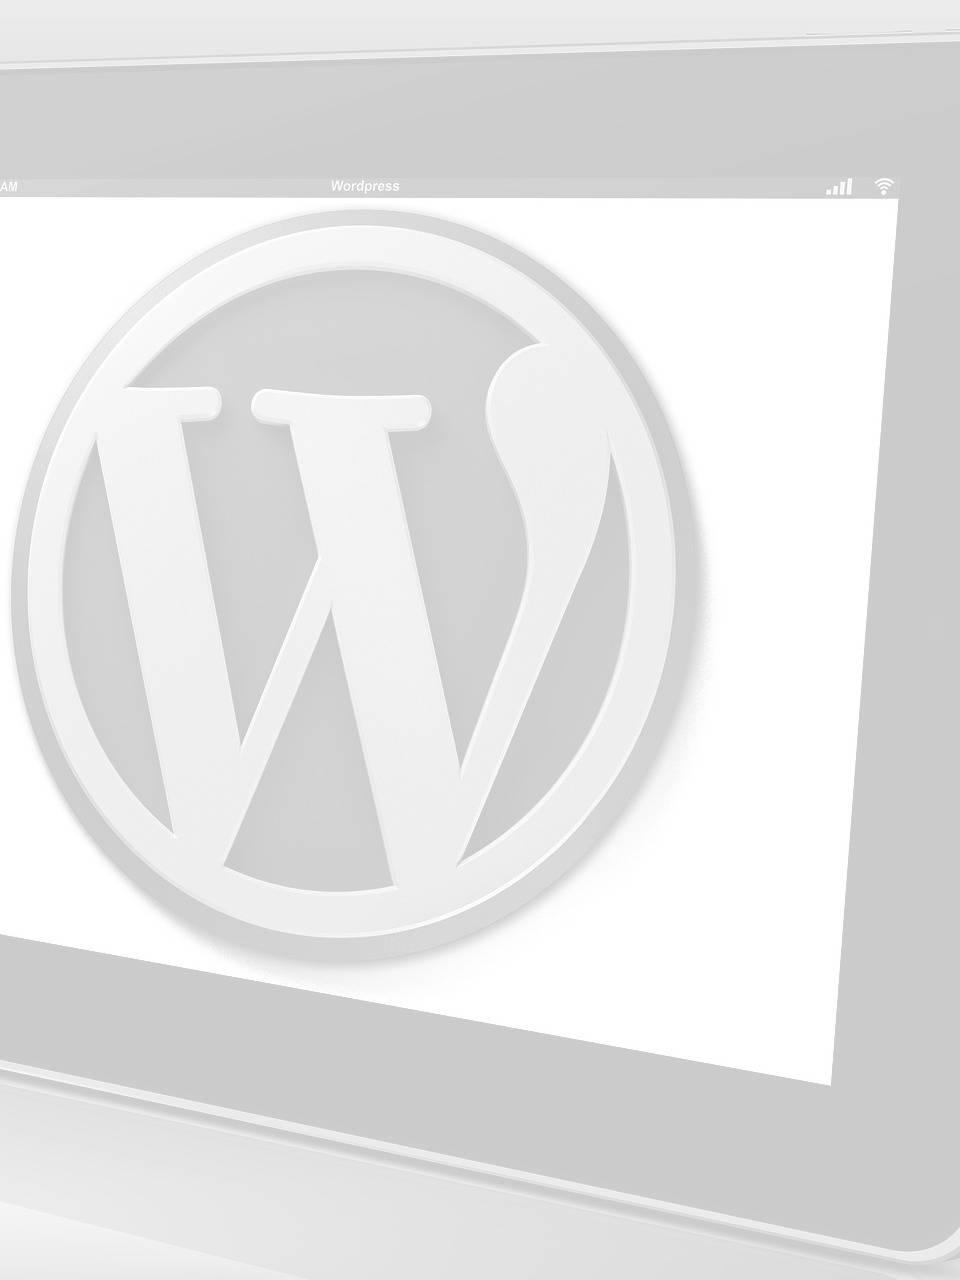 free blog for wordpress web design